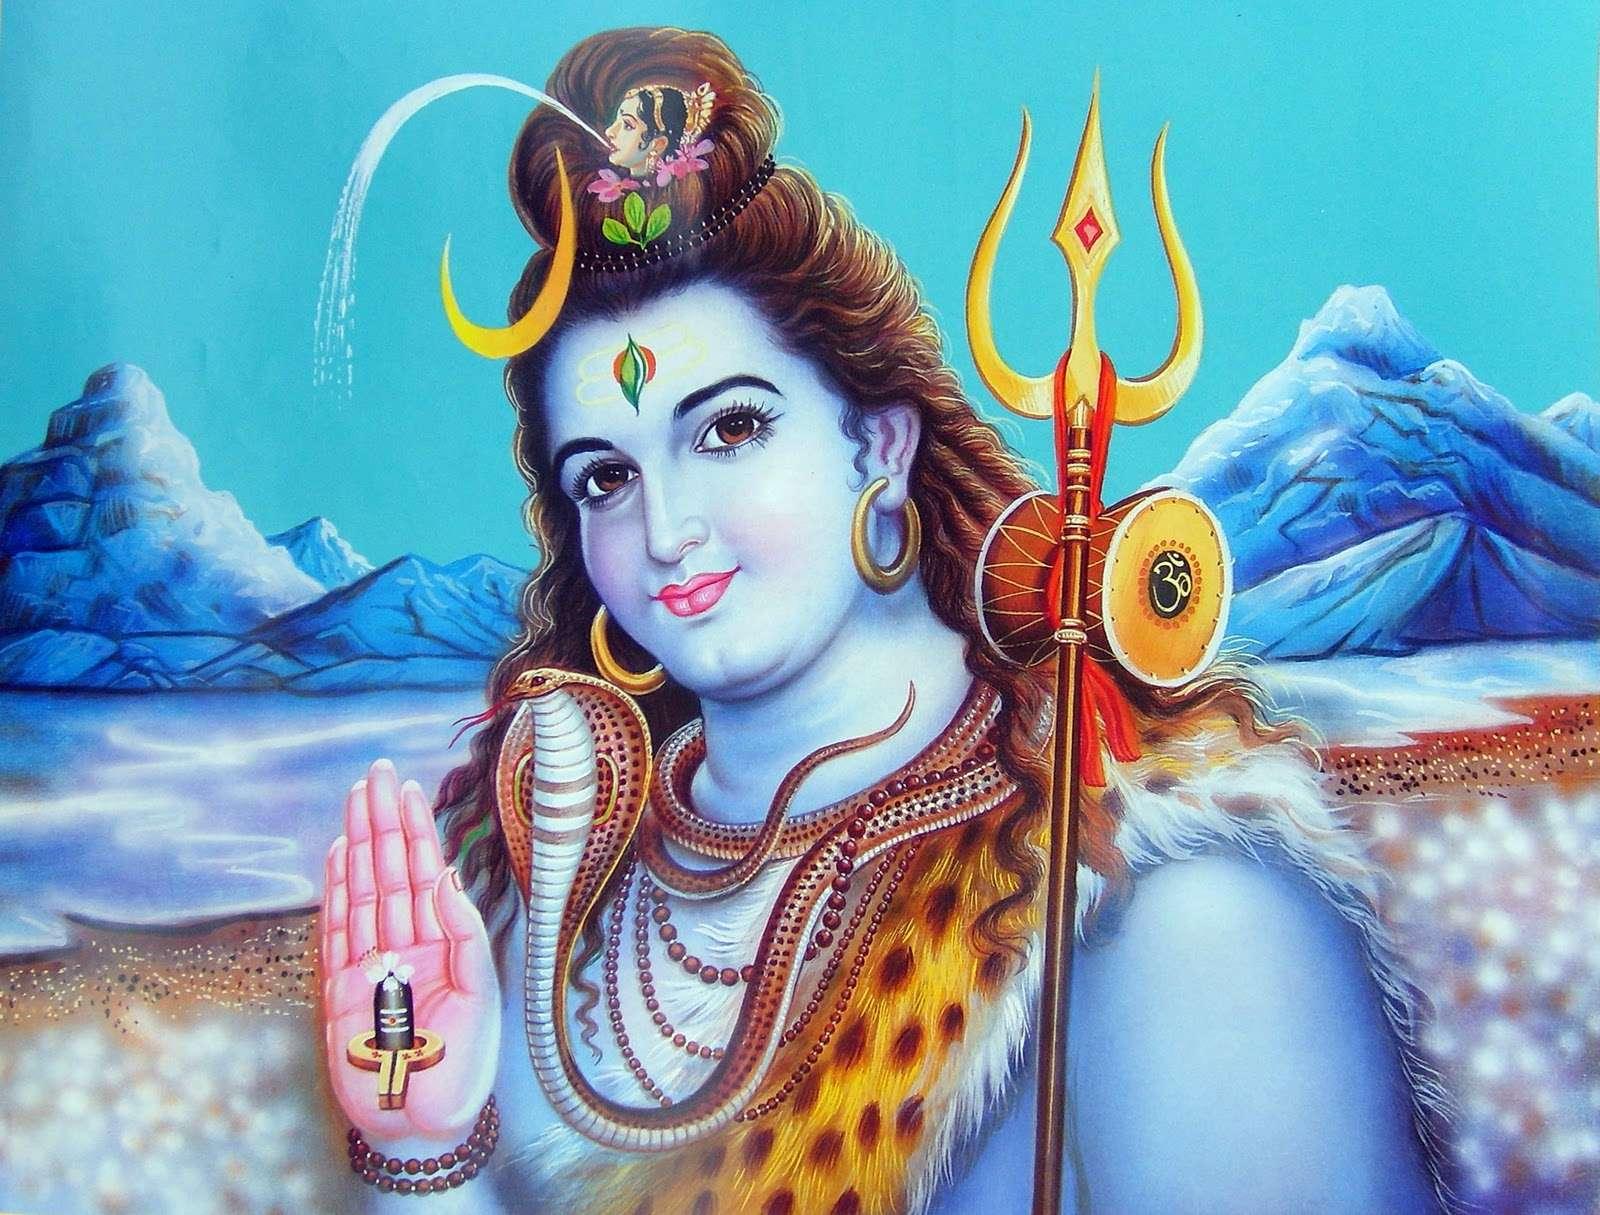 shiva wallpapers hd download for desktop Fine HD Wallpapers 1600x1215